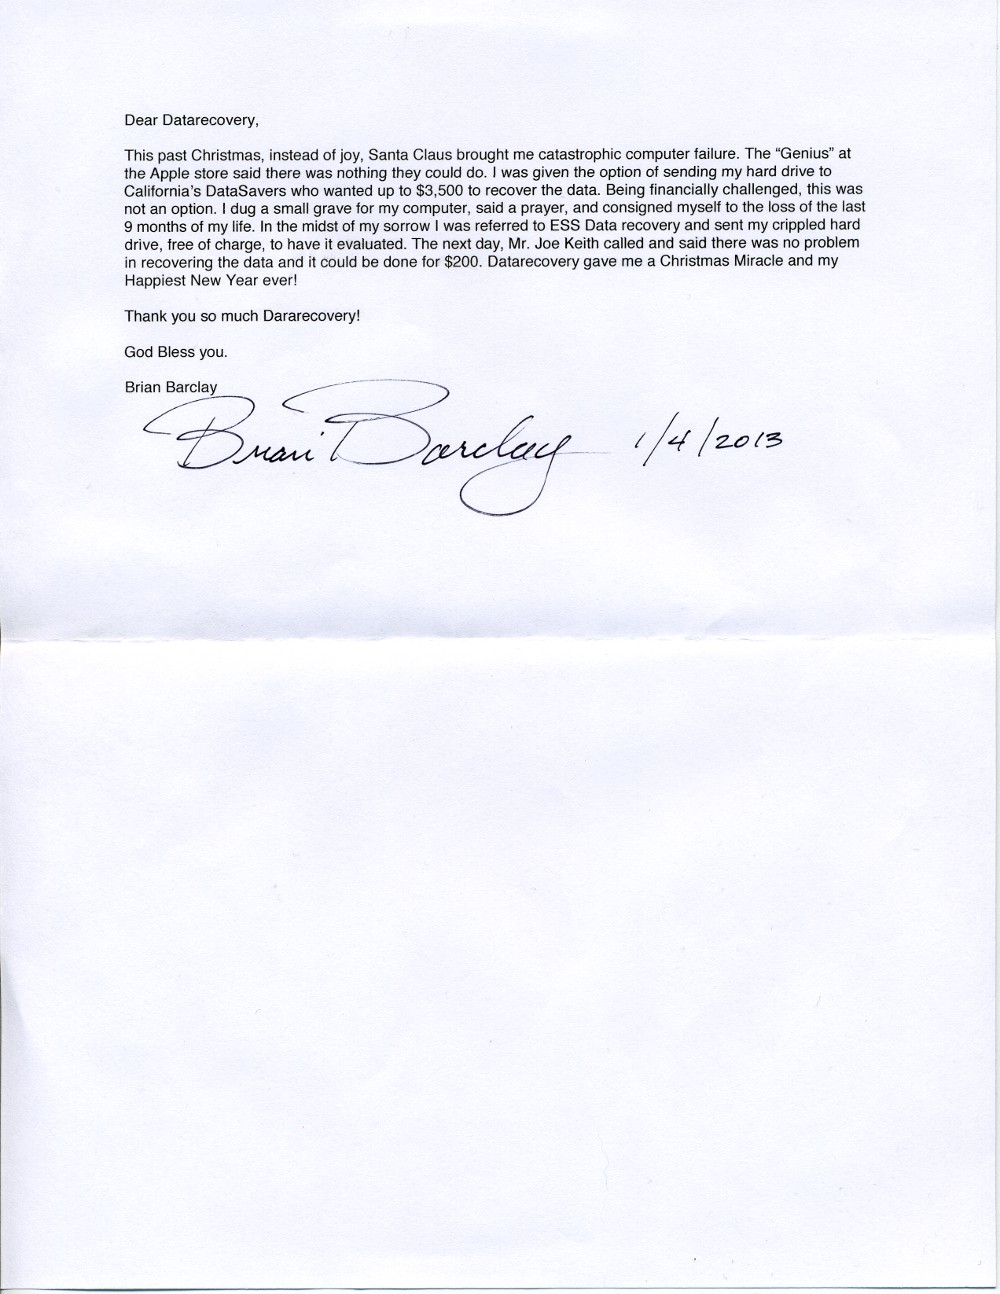 Brian Barclay testimonial